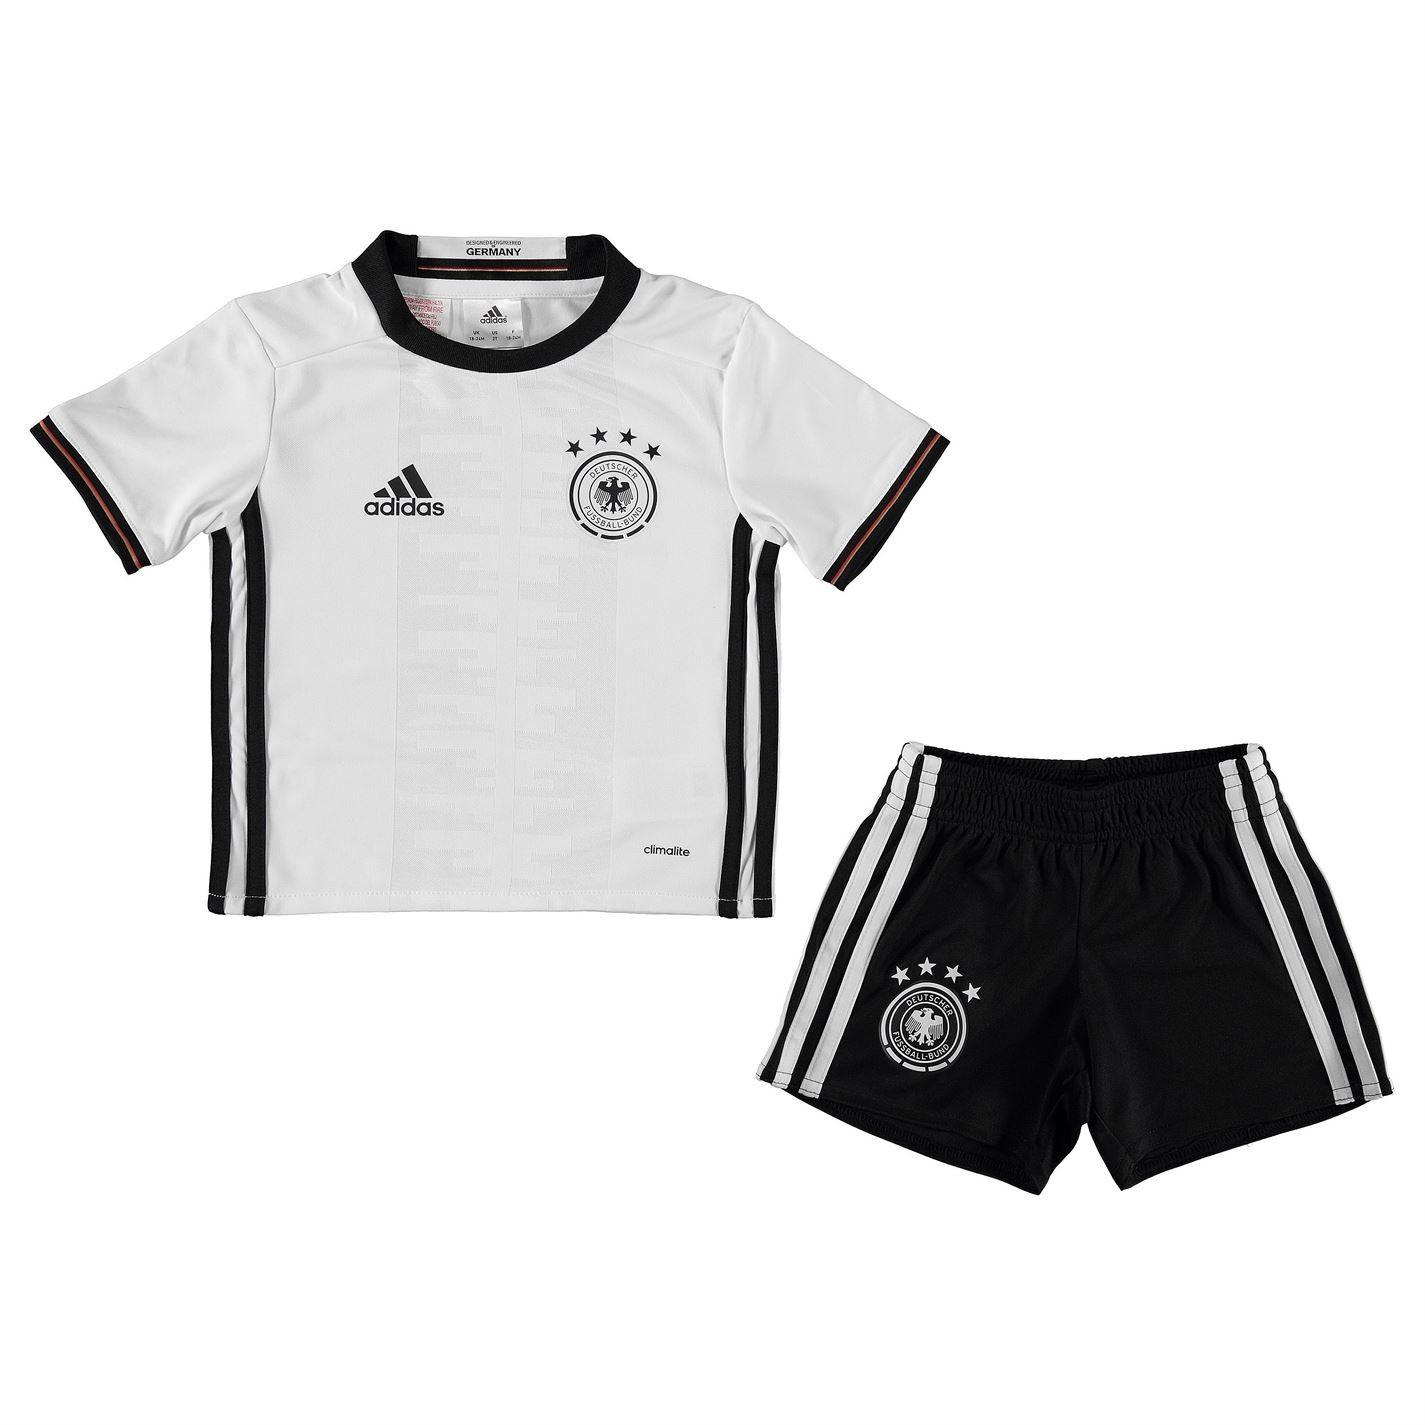 adidas deutschland kit dfb mini trikot hose heimtrikot. Black Bedroom Furniture Sets. Home Design Ideas